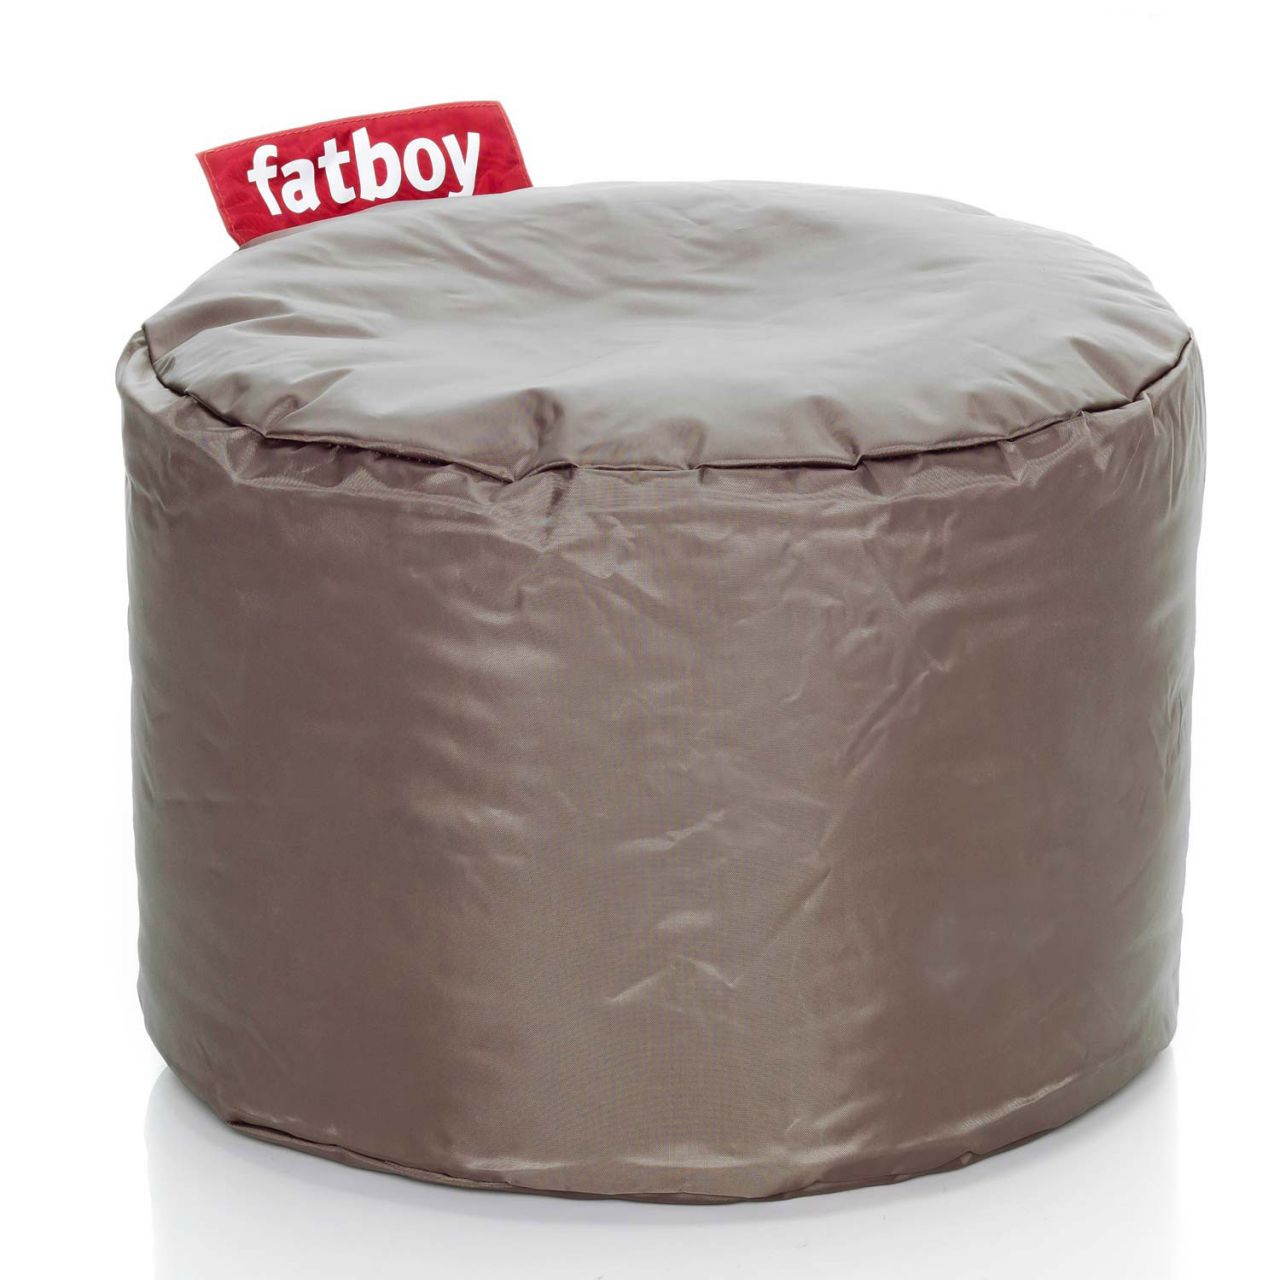 Fatboy - Point Sitzhocker 900.0149